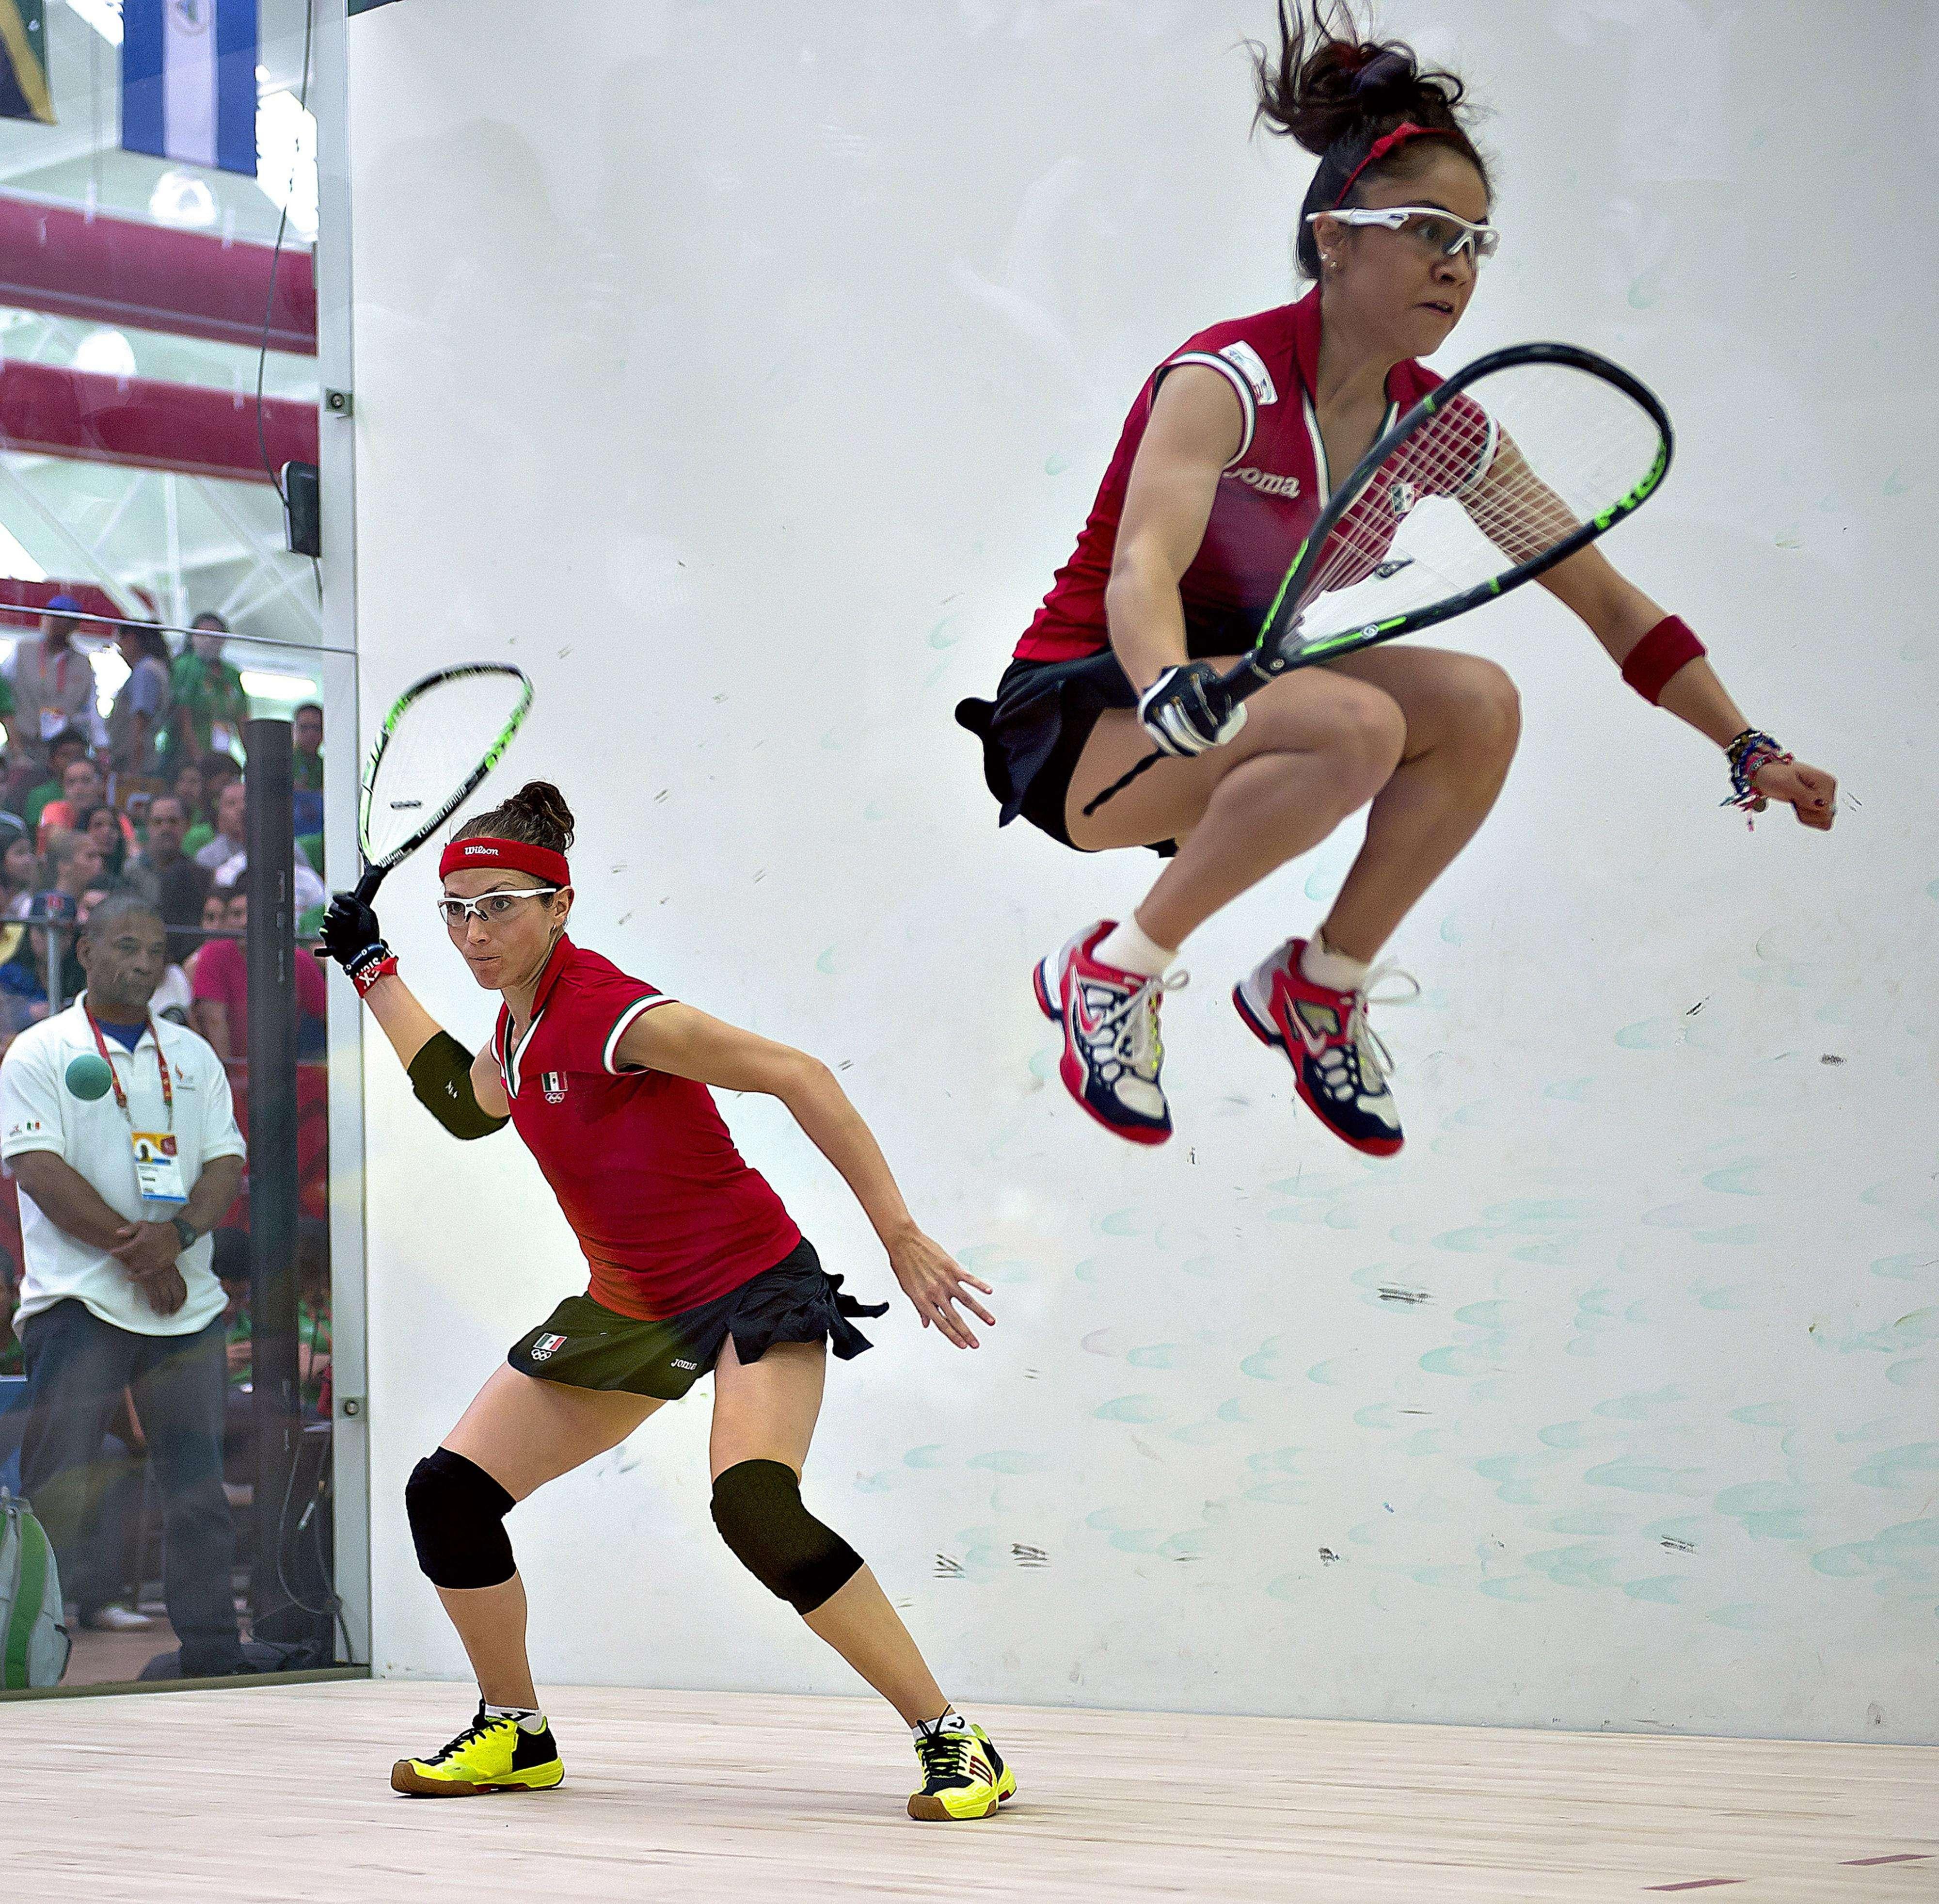 Paola Longoria y Samantha Sala, las dos máximas representantes de Racquetbol mexicano Foto: Mexsports